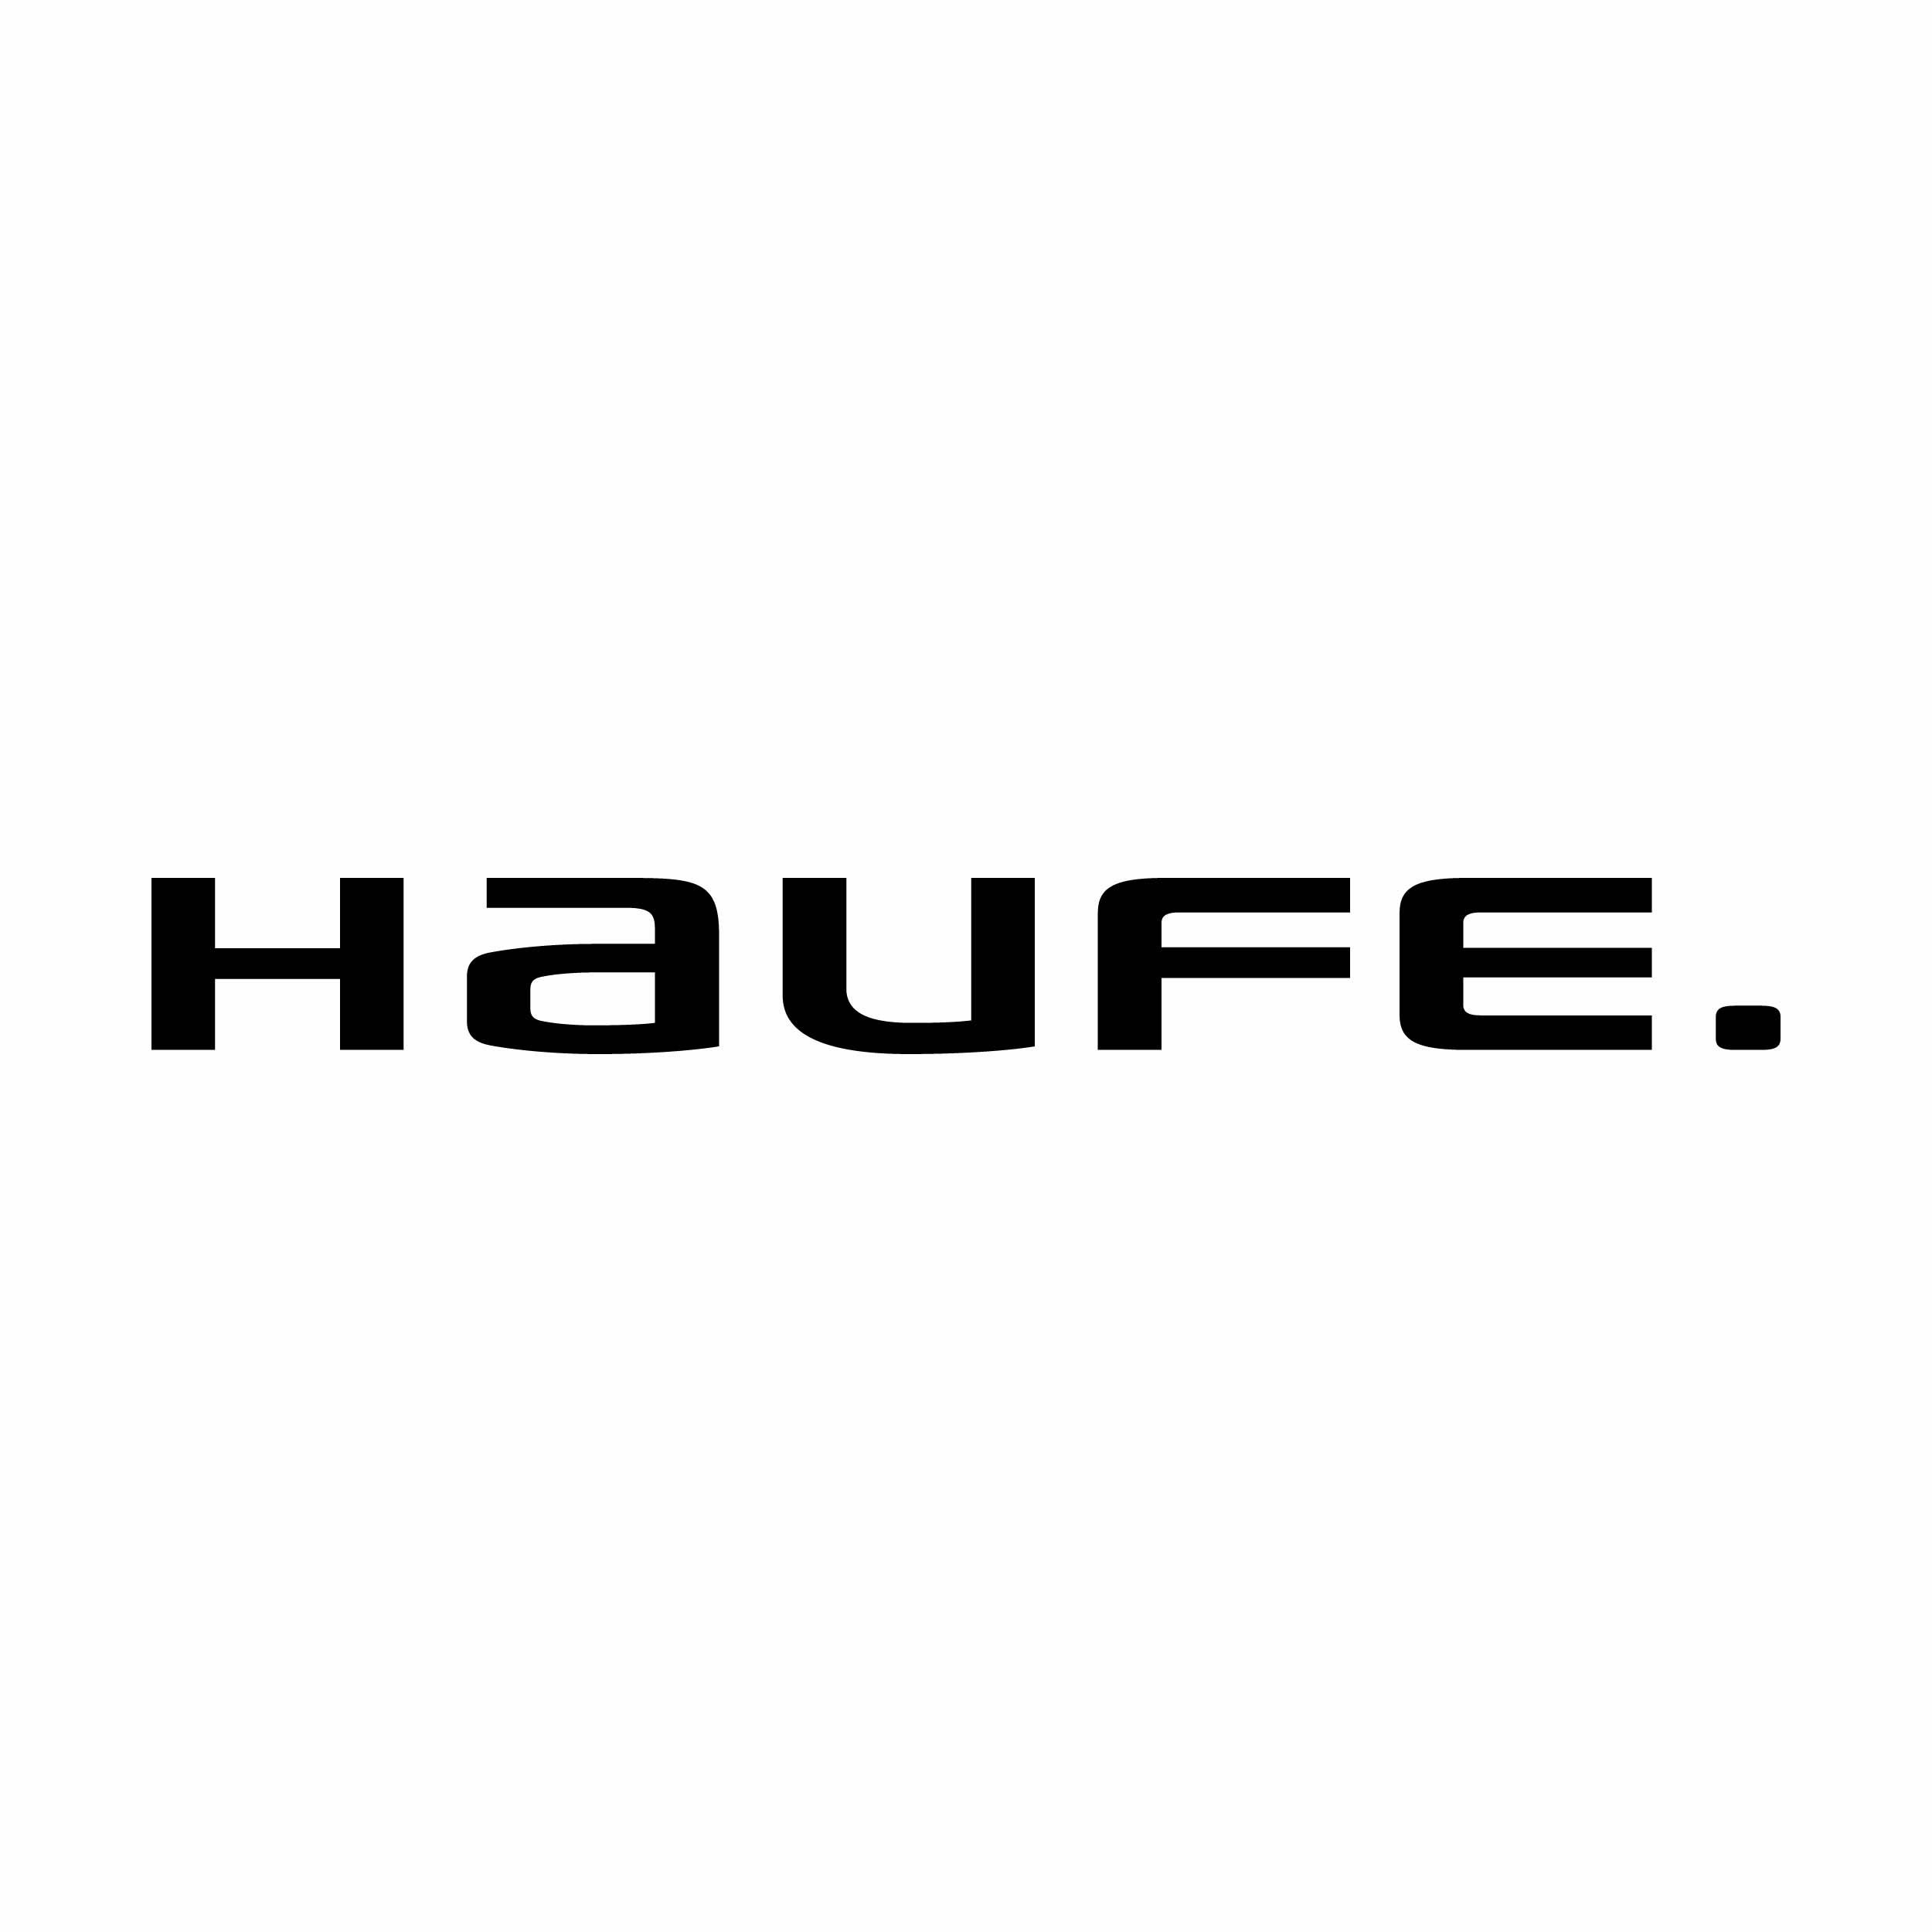 Bayern Munich_Haufe_2.jpg